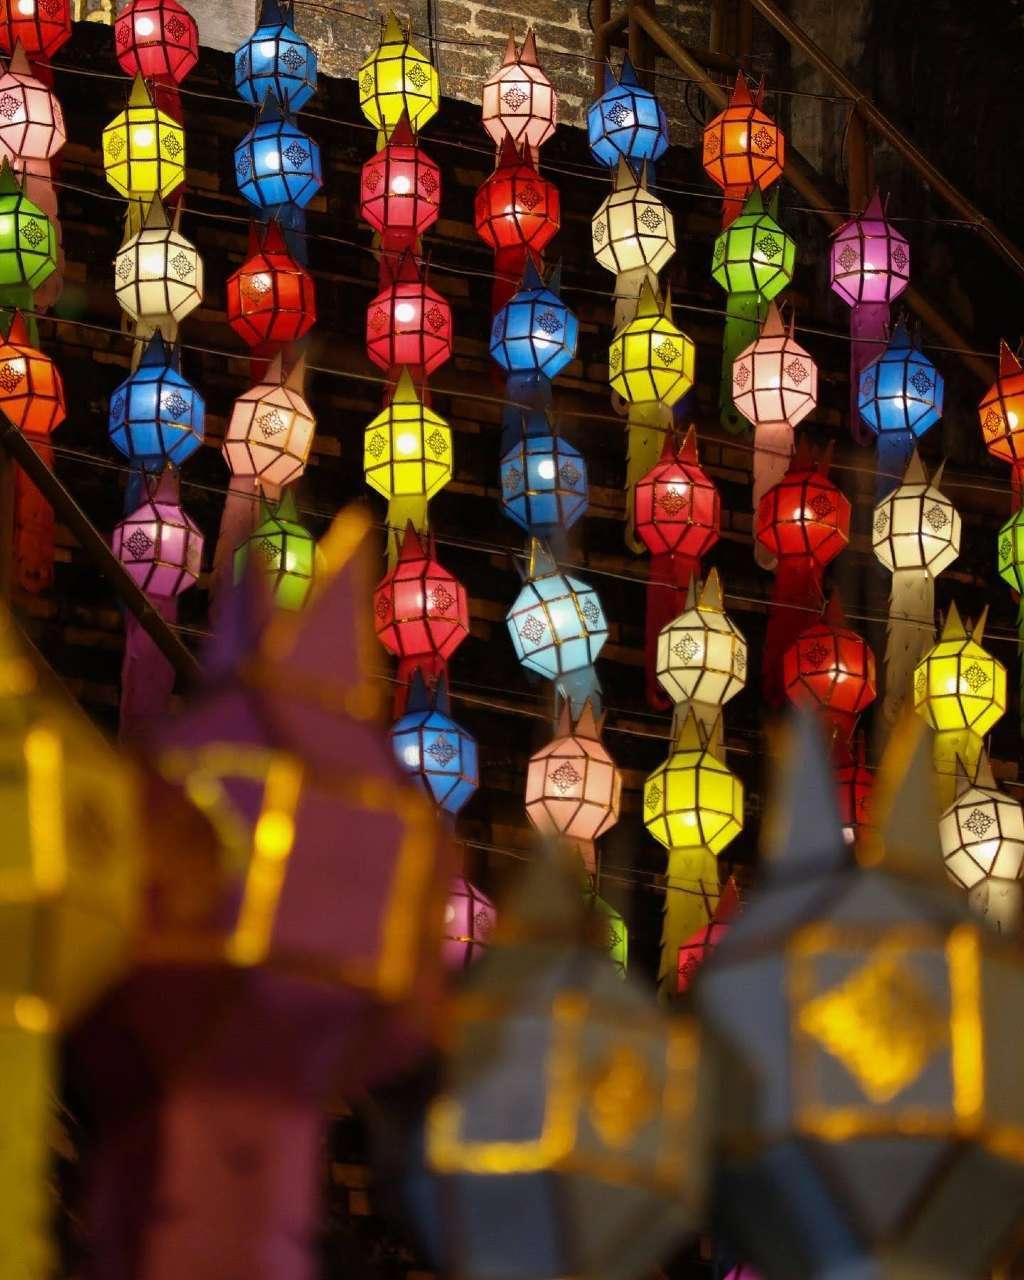 Gekleurde lampionnen op het Yi Peng Festival in Chiang Mai, Thailand